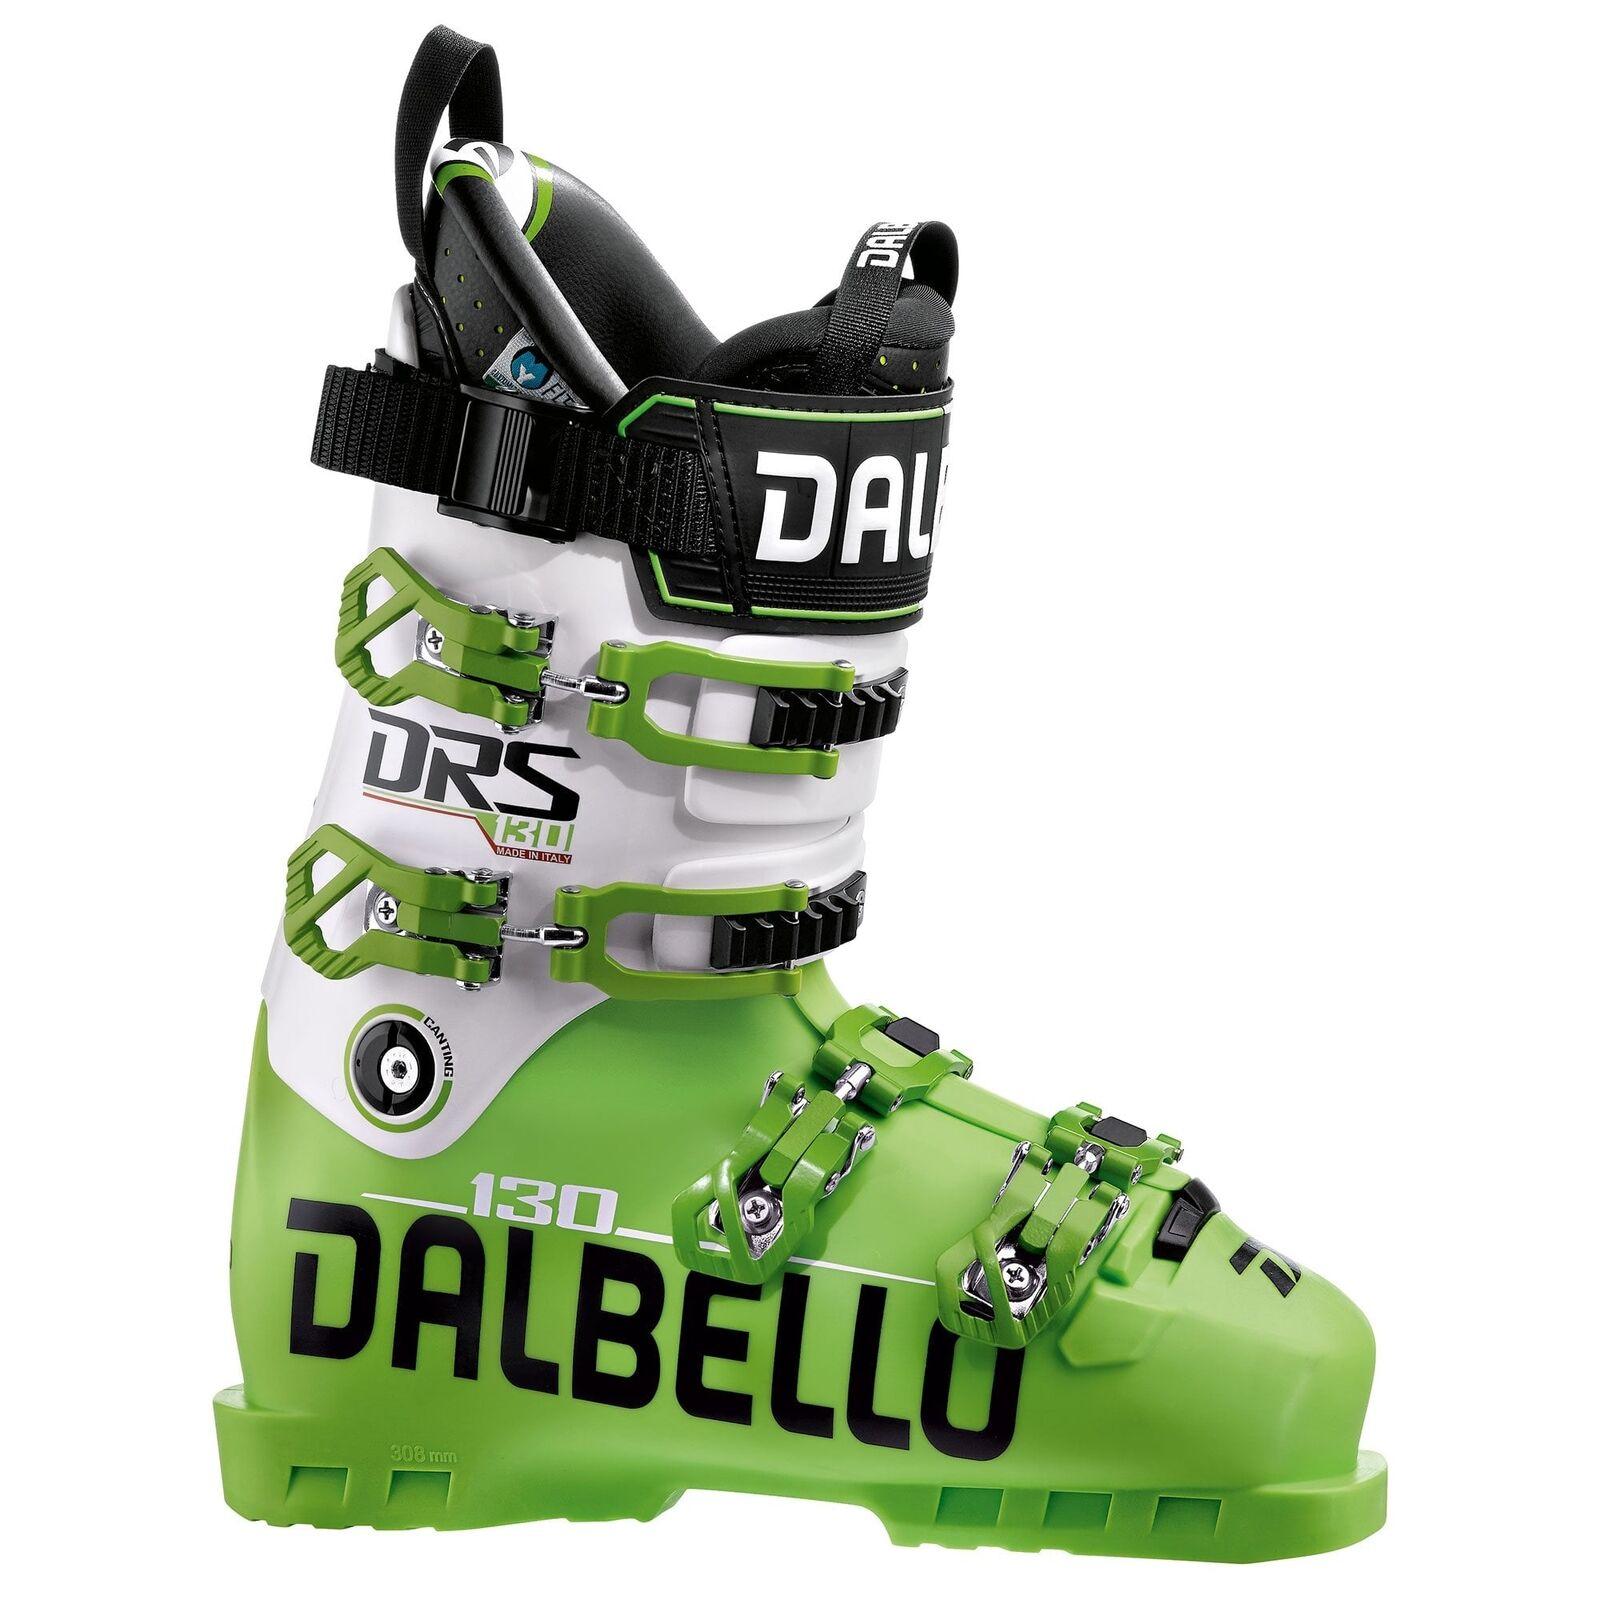 Dalbello DRS  130 Race Ski Boot  sale online discount low price